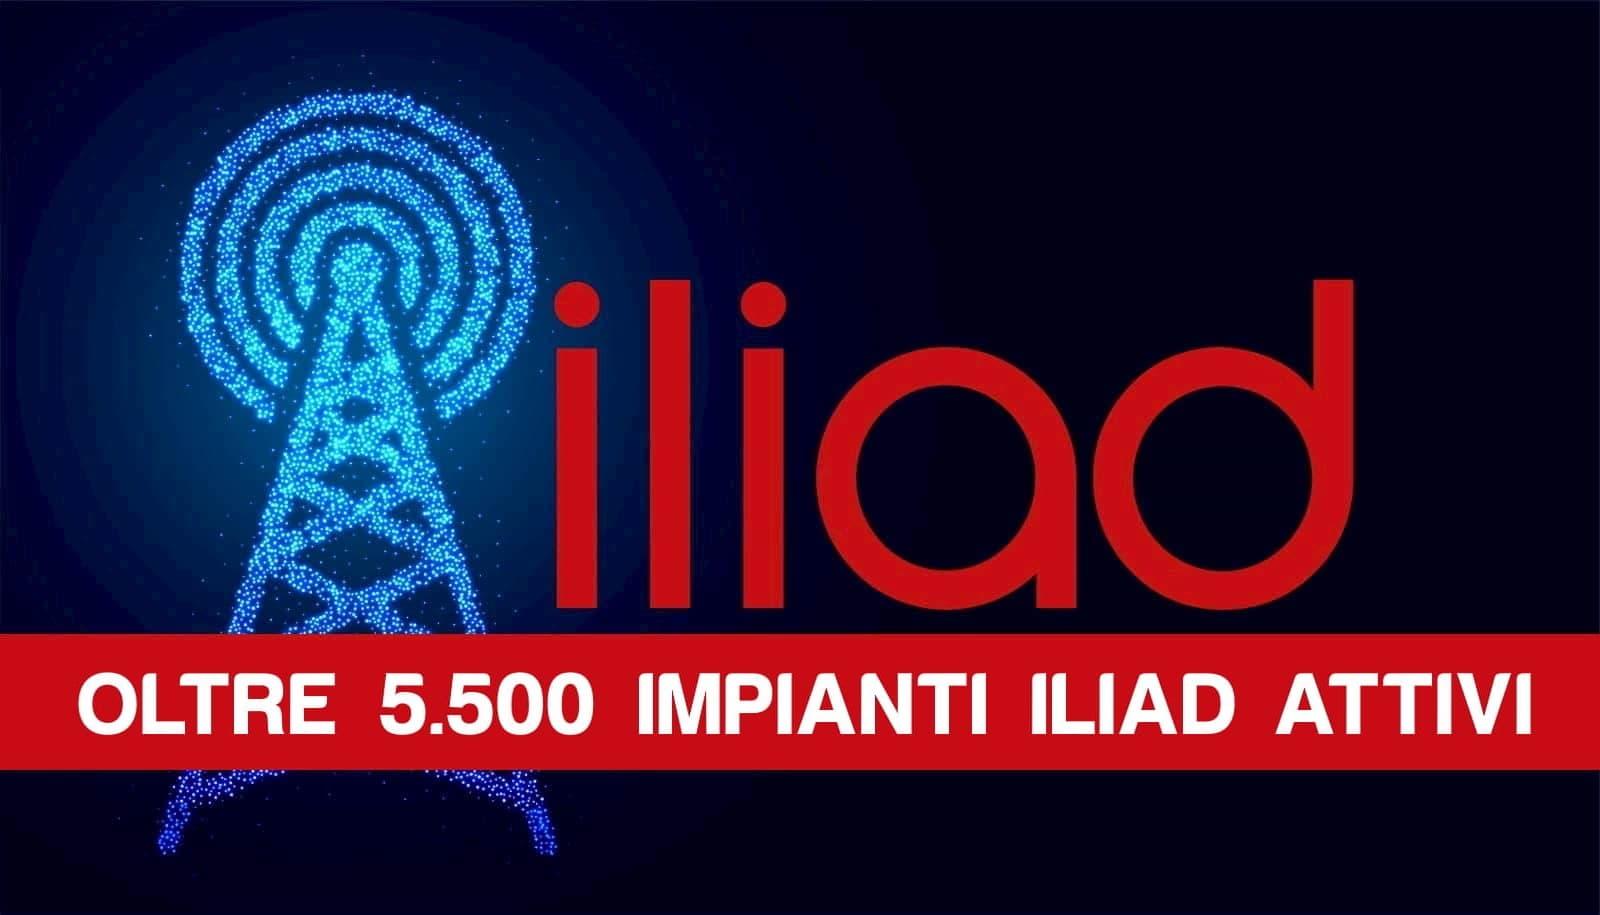 5500 impianti 4G iliad